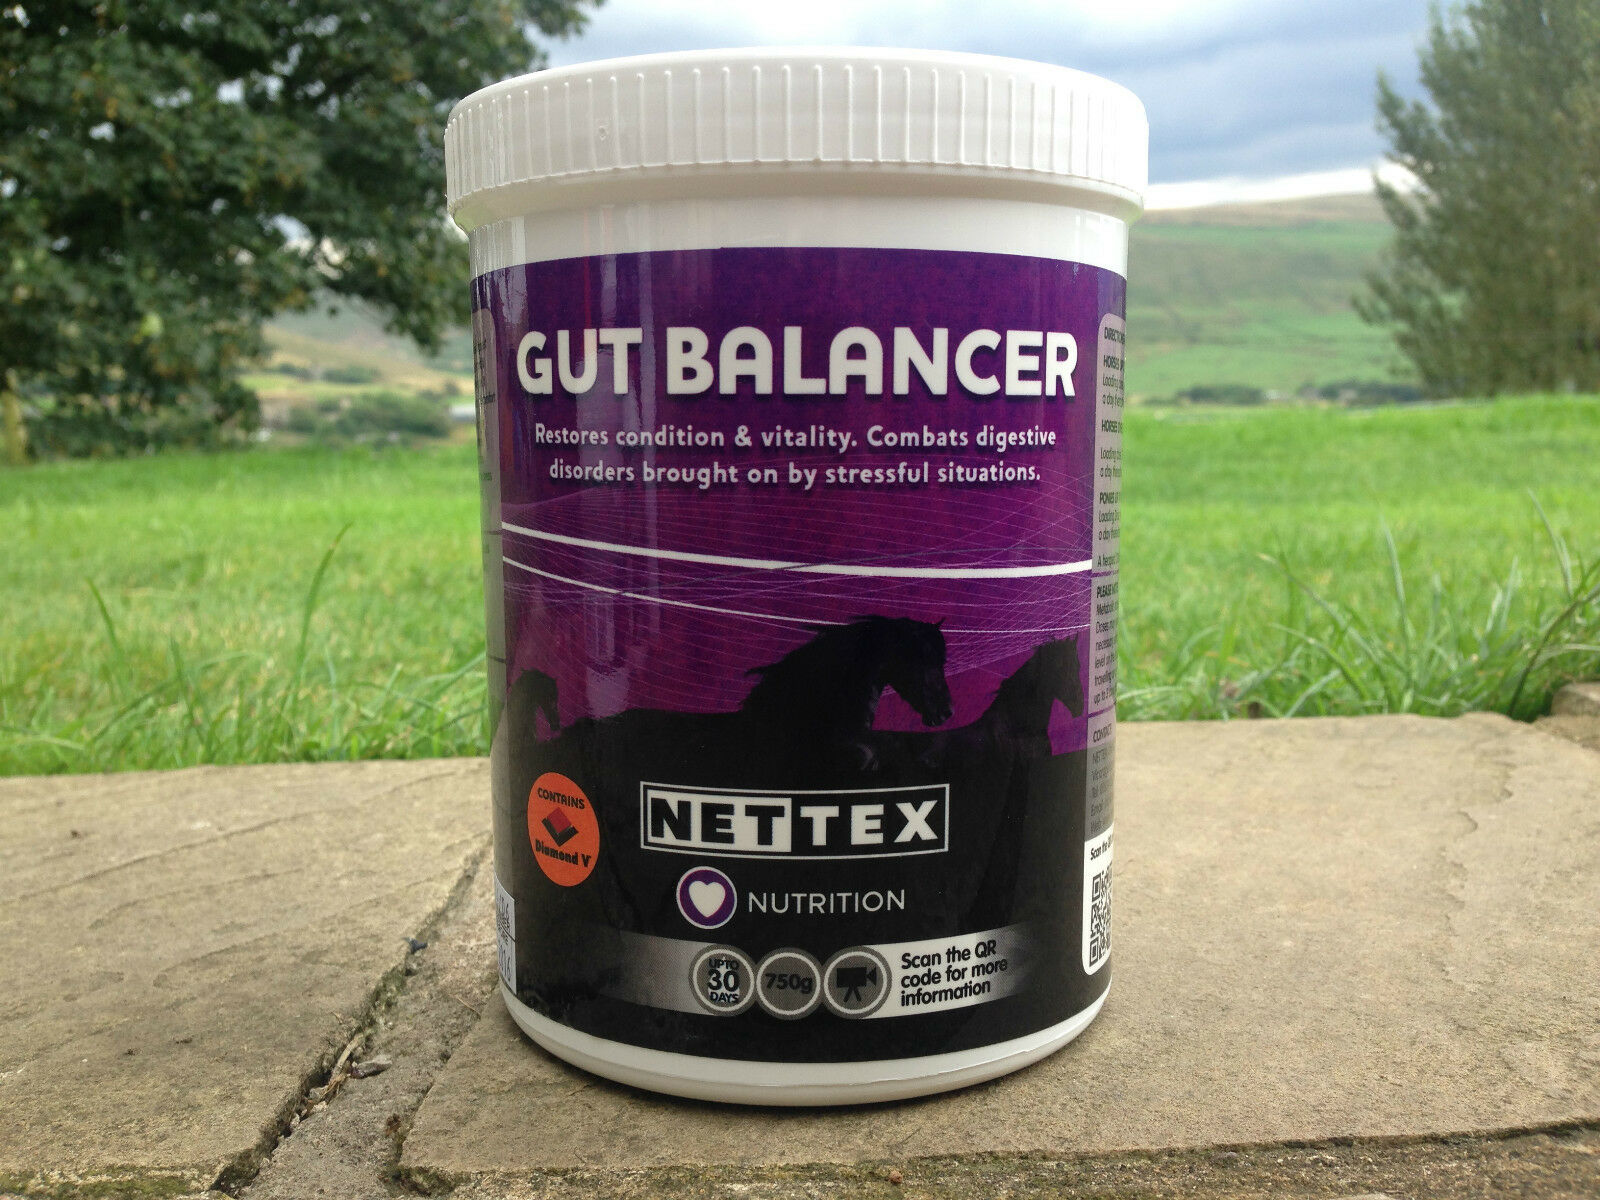 NETTEX GUT BALANCER 750G, 1.5KG